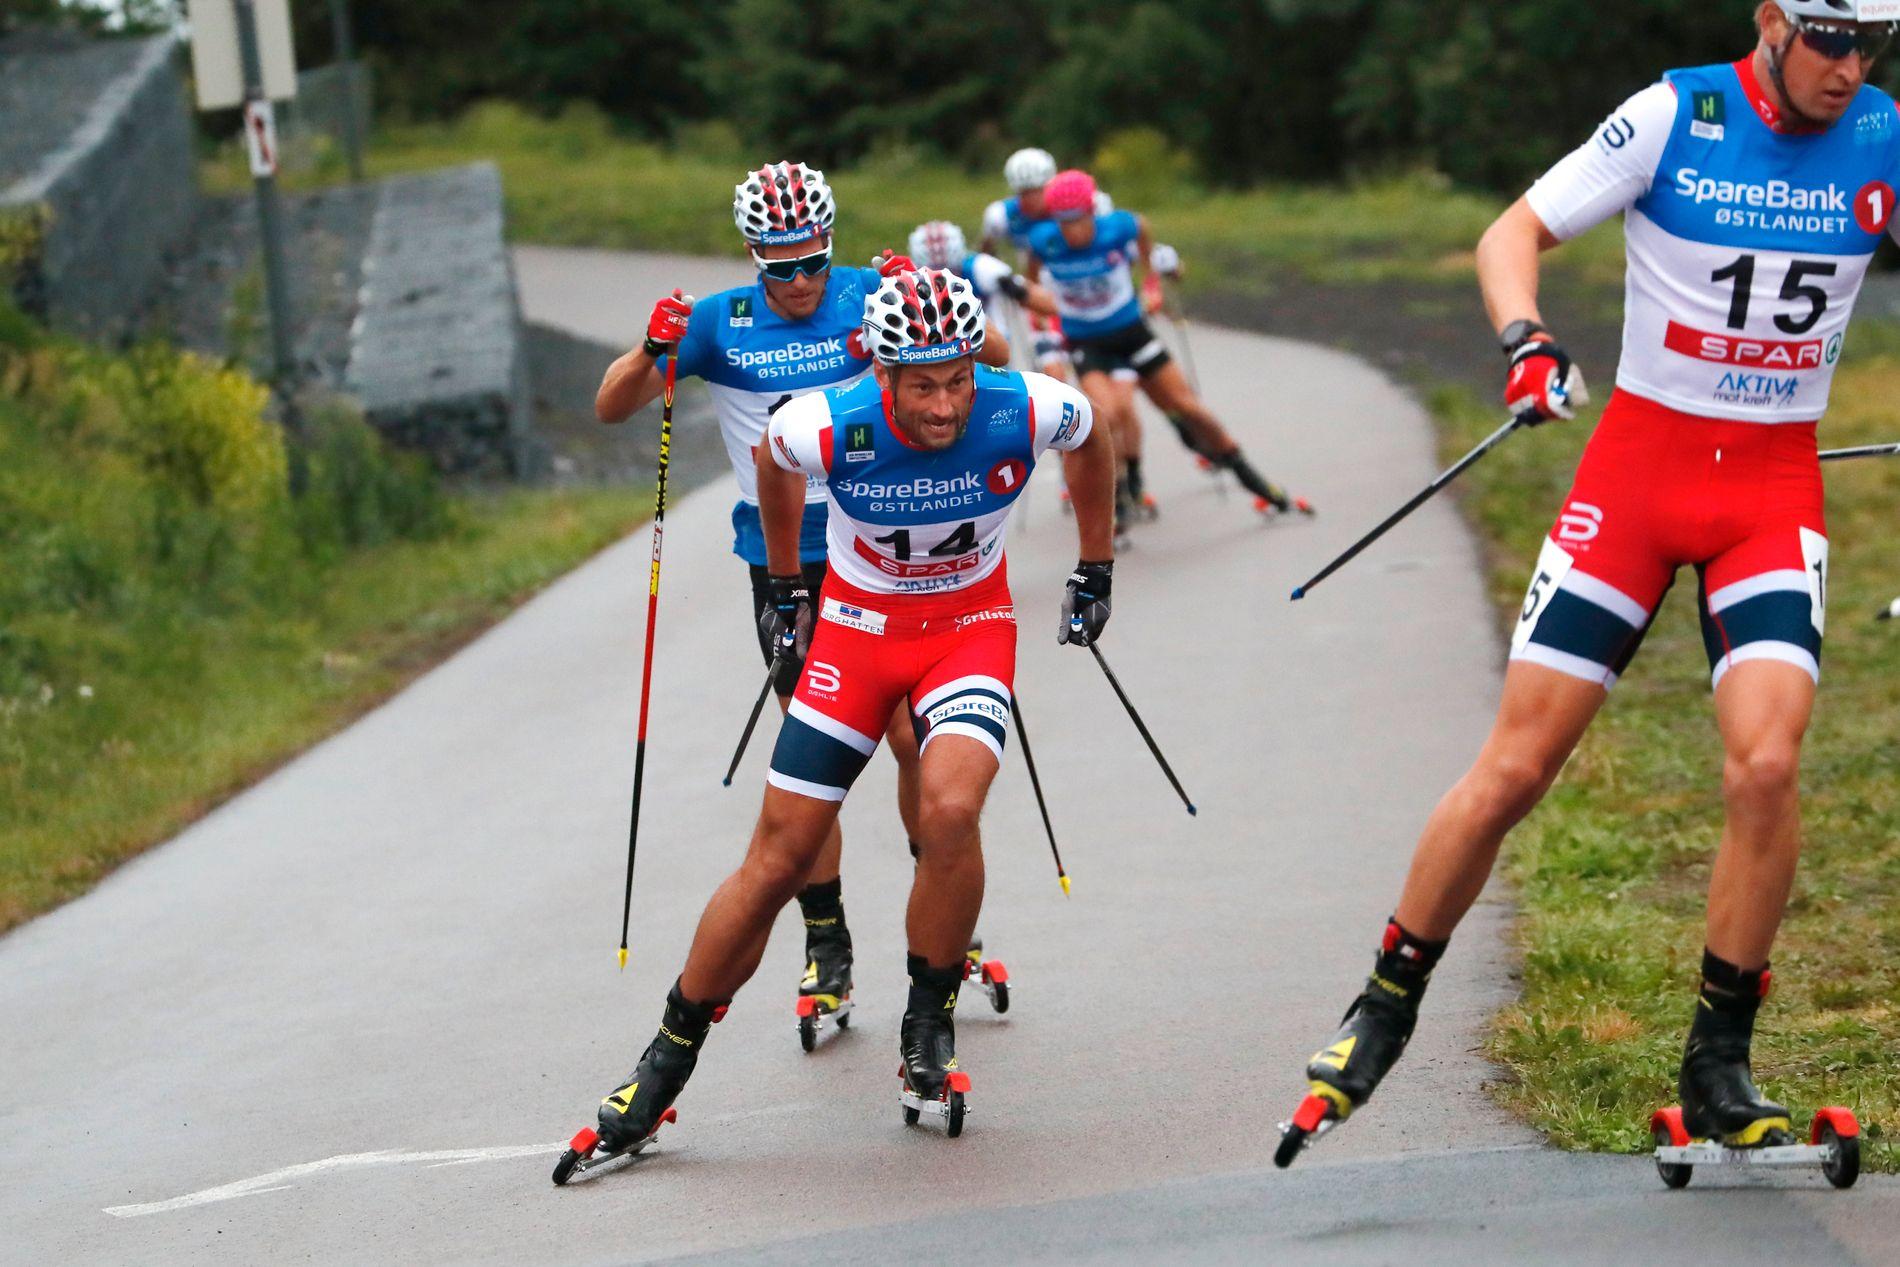 – TRENINGSØKT: Det sa Petter Northug etter at rundt 15 kilometer, både prolog og jaktstart, var unnagjort i rulleskiløypa i Holmenkollen under Oslo Skishow torsdag.